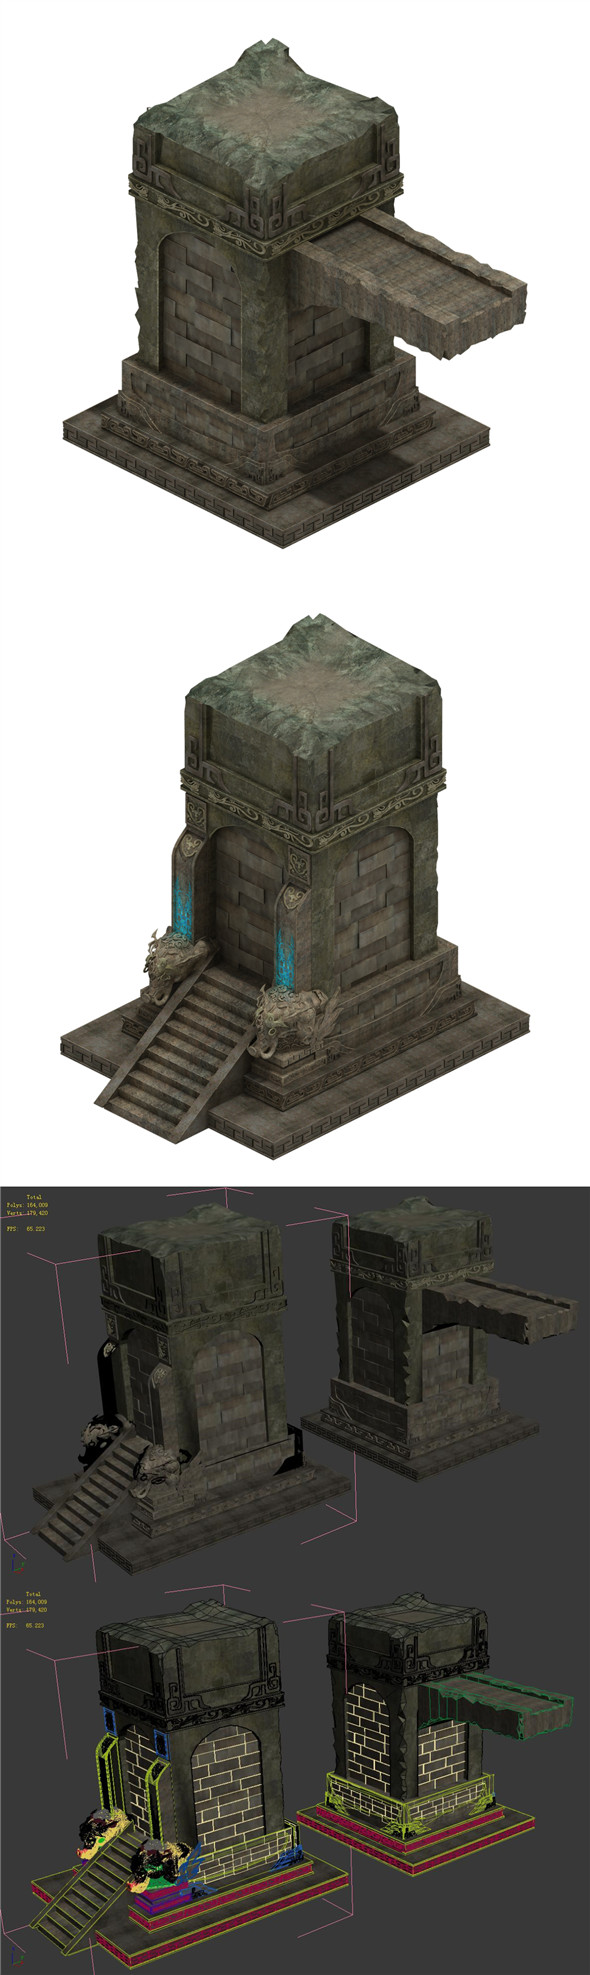 Desert ancient ruins - broken buildings - 3DOcean Item for Sale